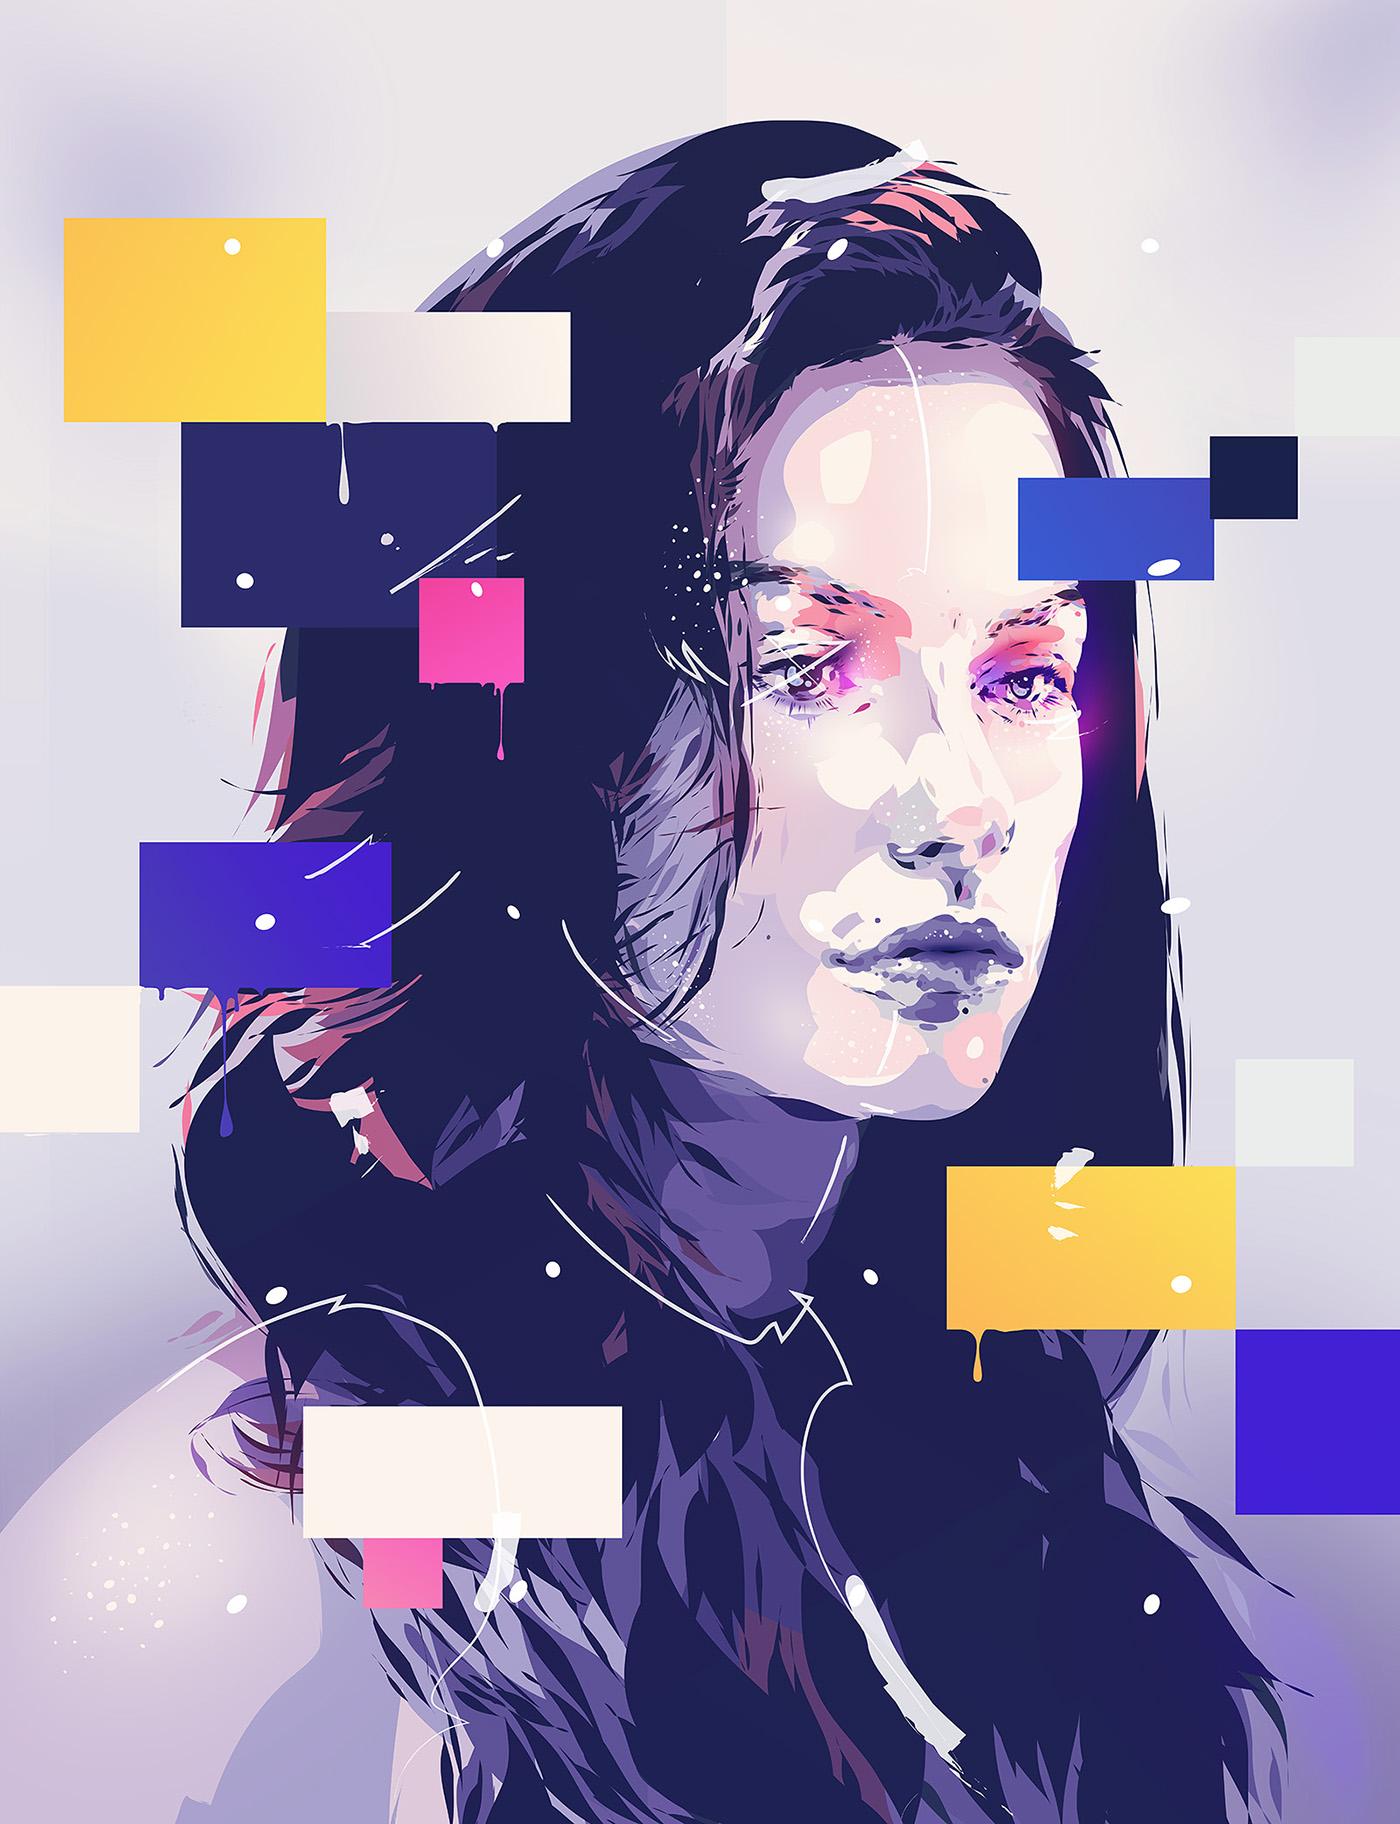 BramTalks on How to Create New Digital Art